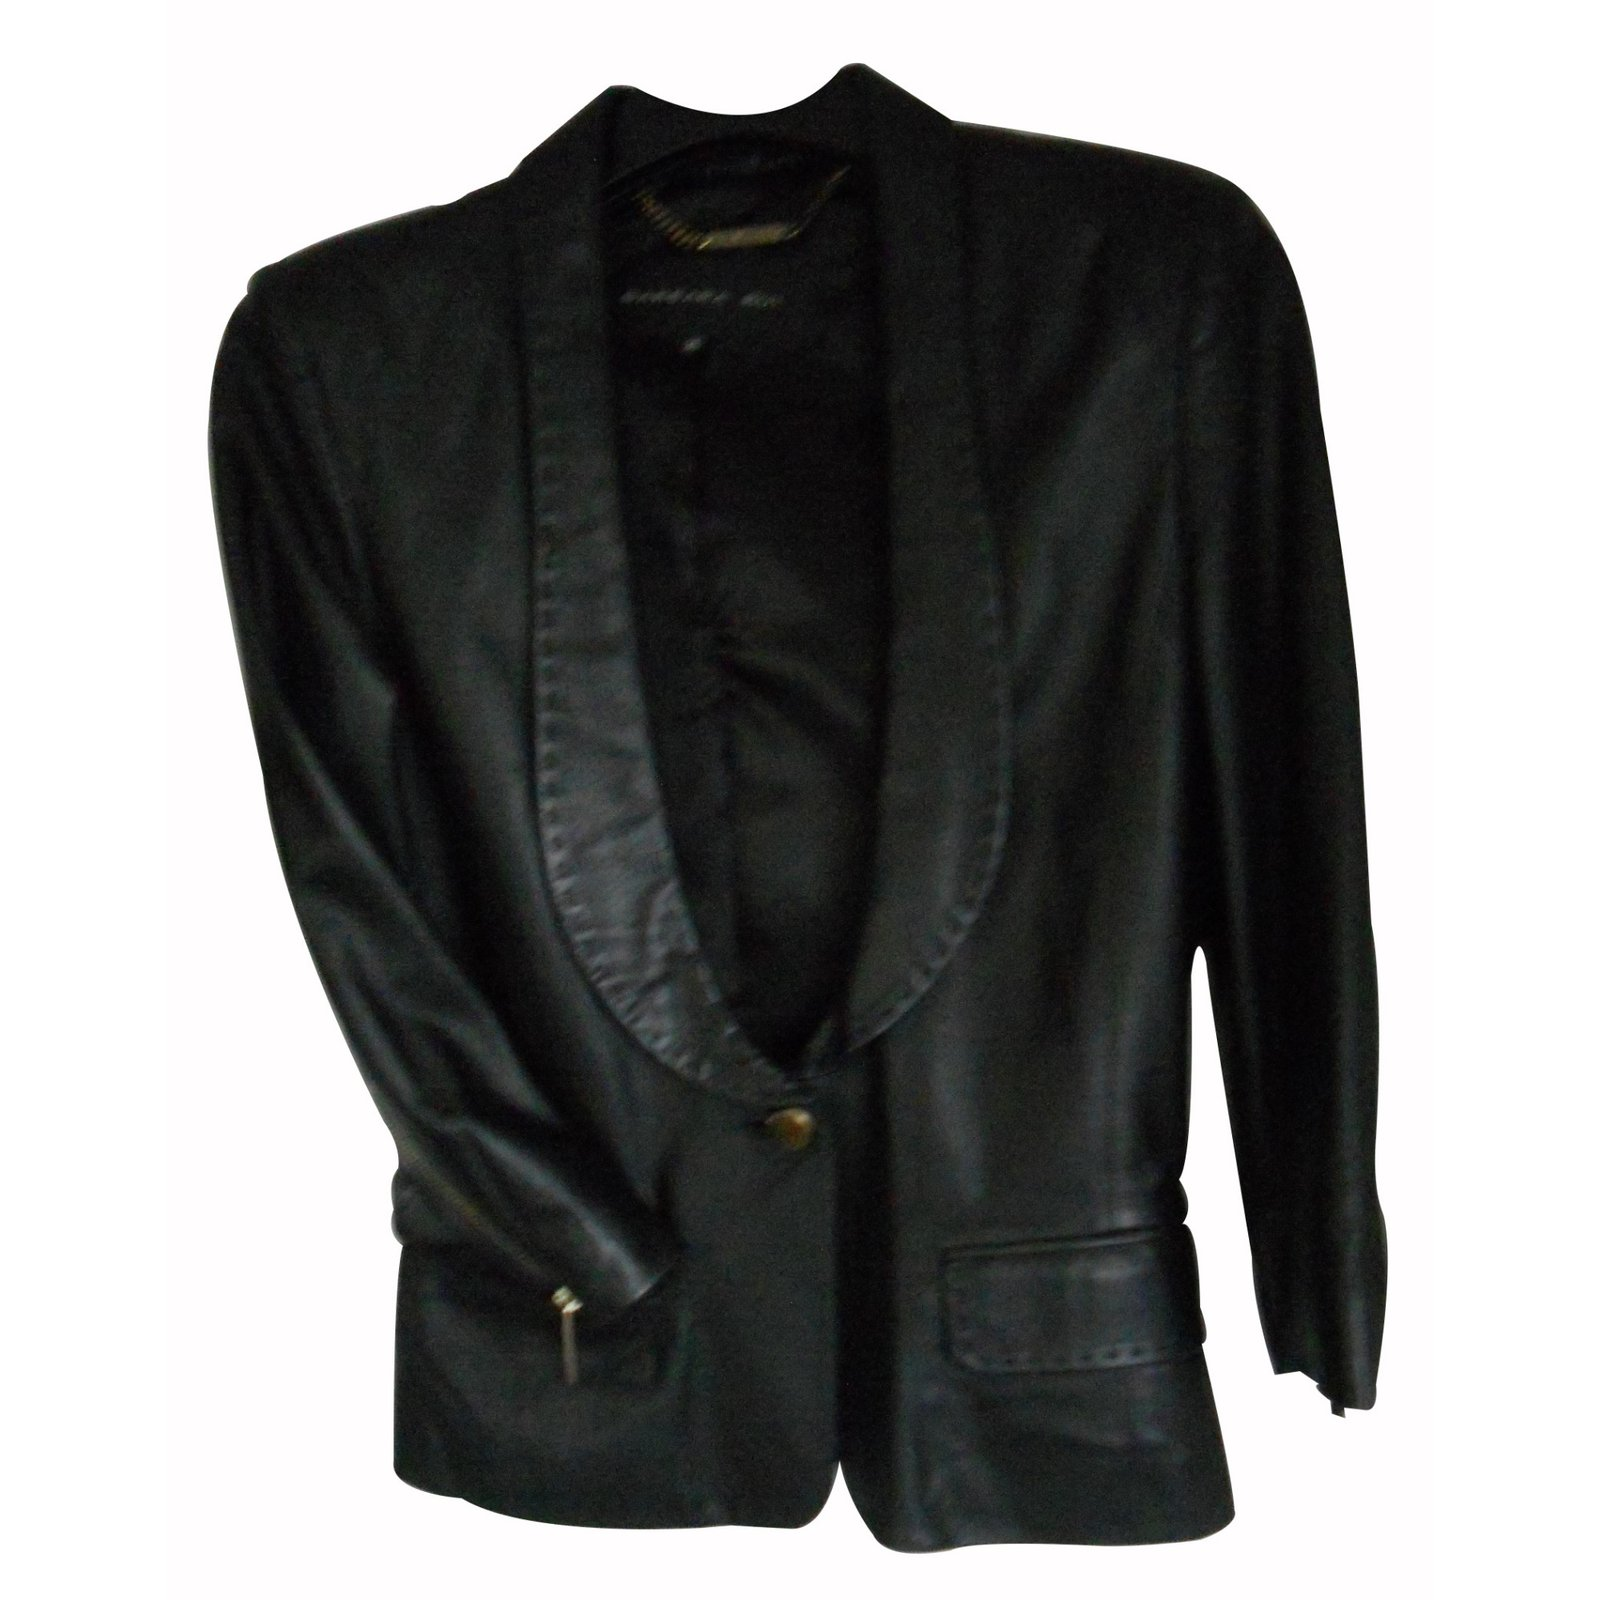 vestes barbara bui veste cuir noir manche 3 4 cuir noir. Black Bedroom Furniture Sets. Home Design Ideas